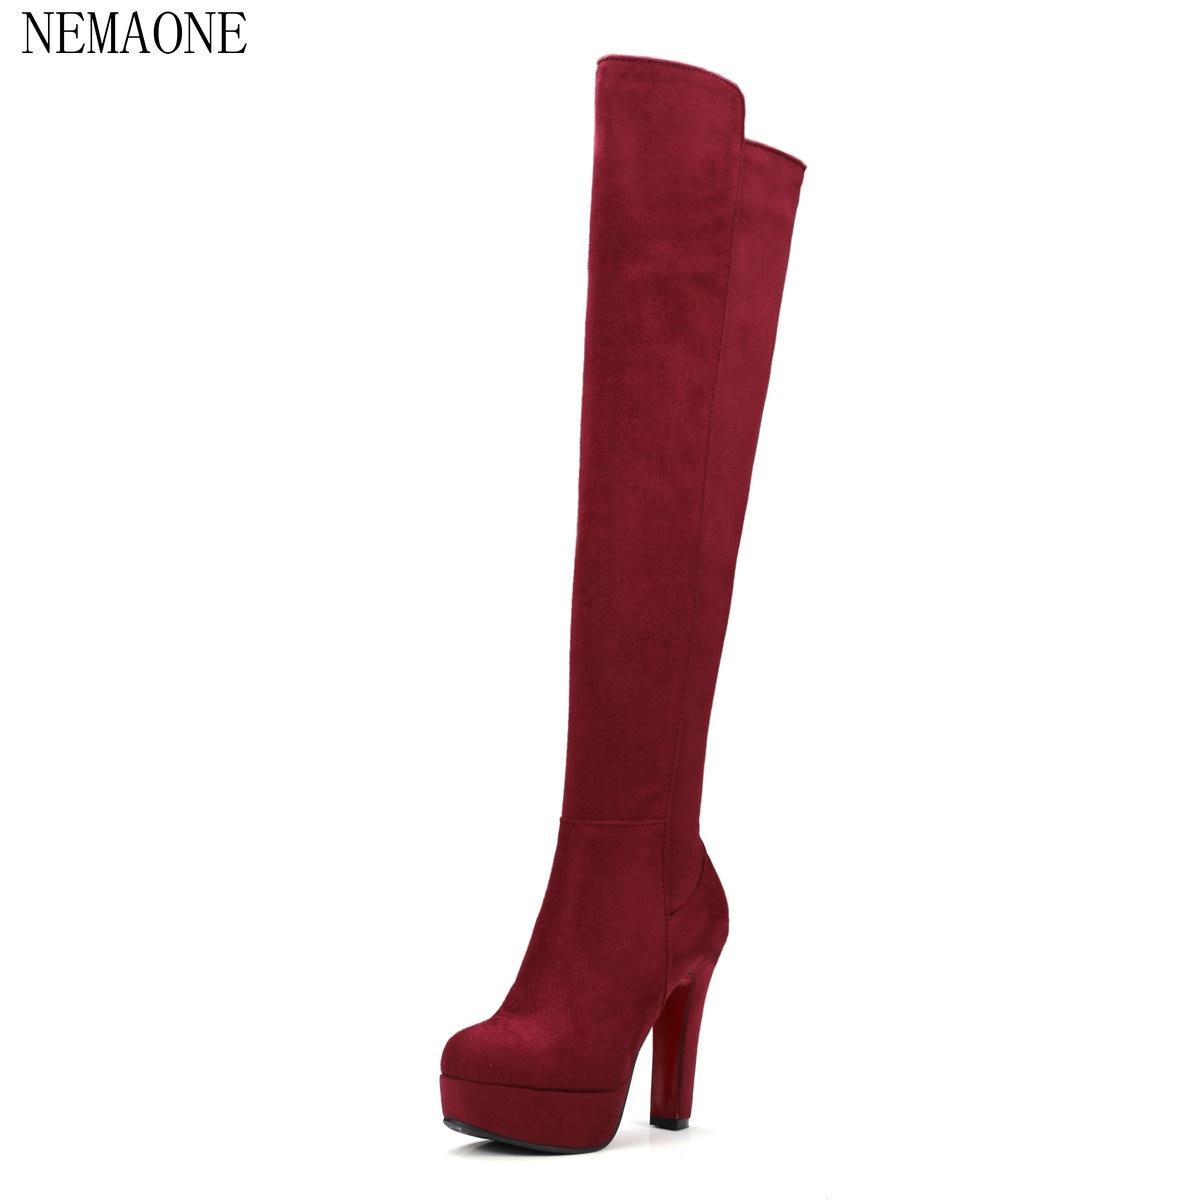 NEMAONE 2018 Women Boots Thigh High Boots Knee Boots Platform Thin High Heels Boots Ladies Shoes Big Size 34- 43